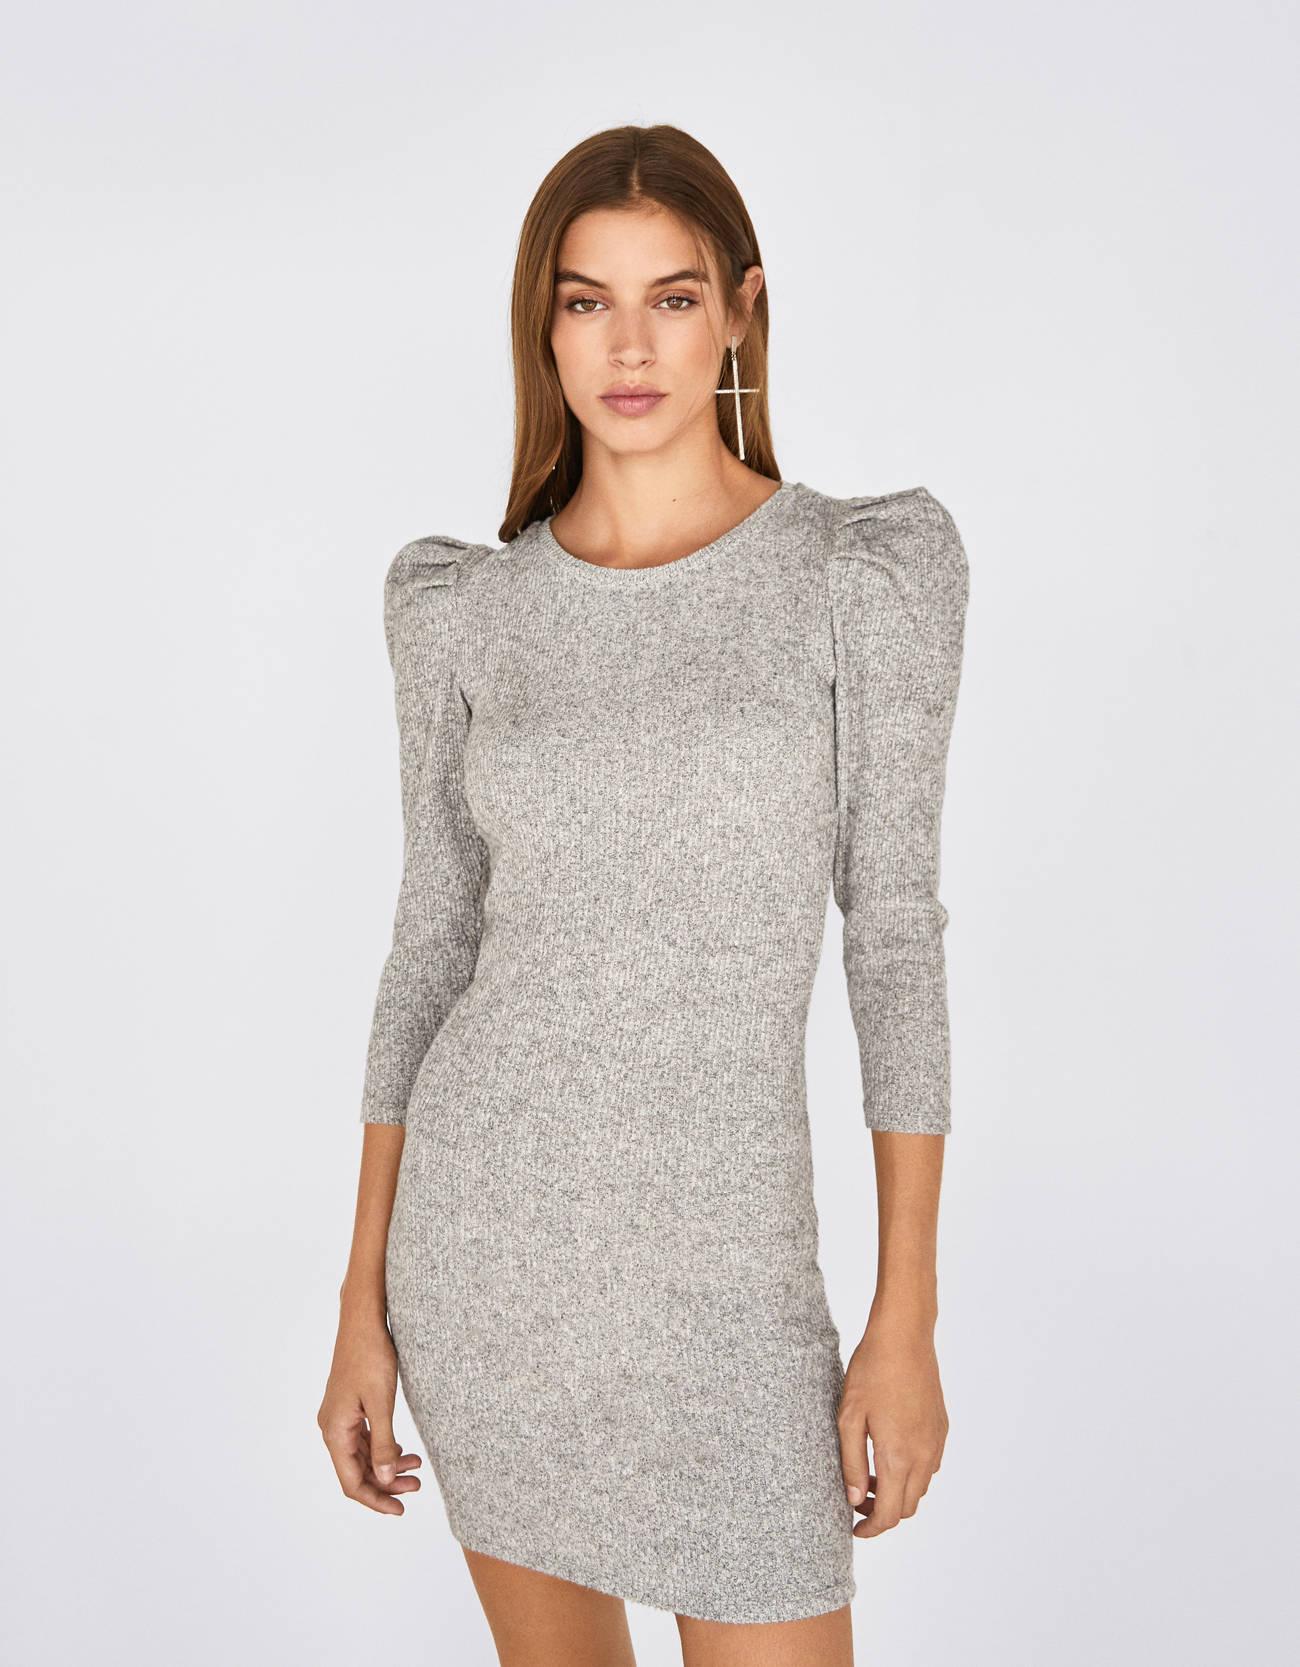 Платье с рукавами-фонариками Серый Bershka